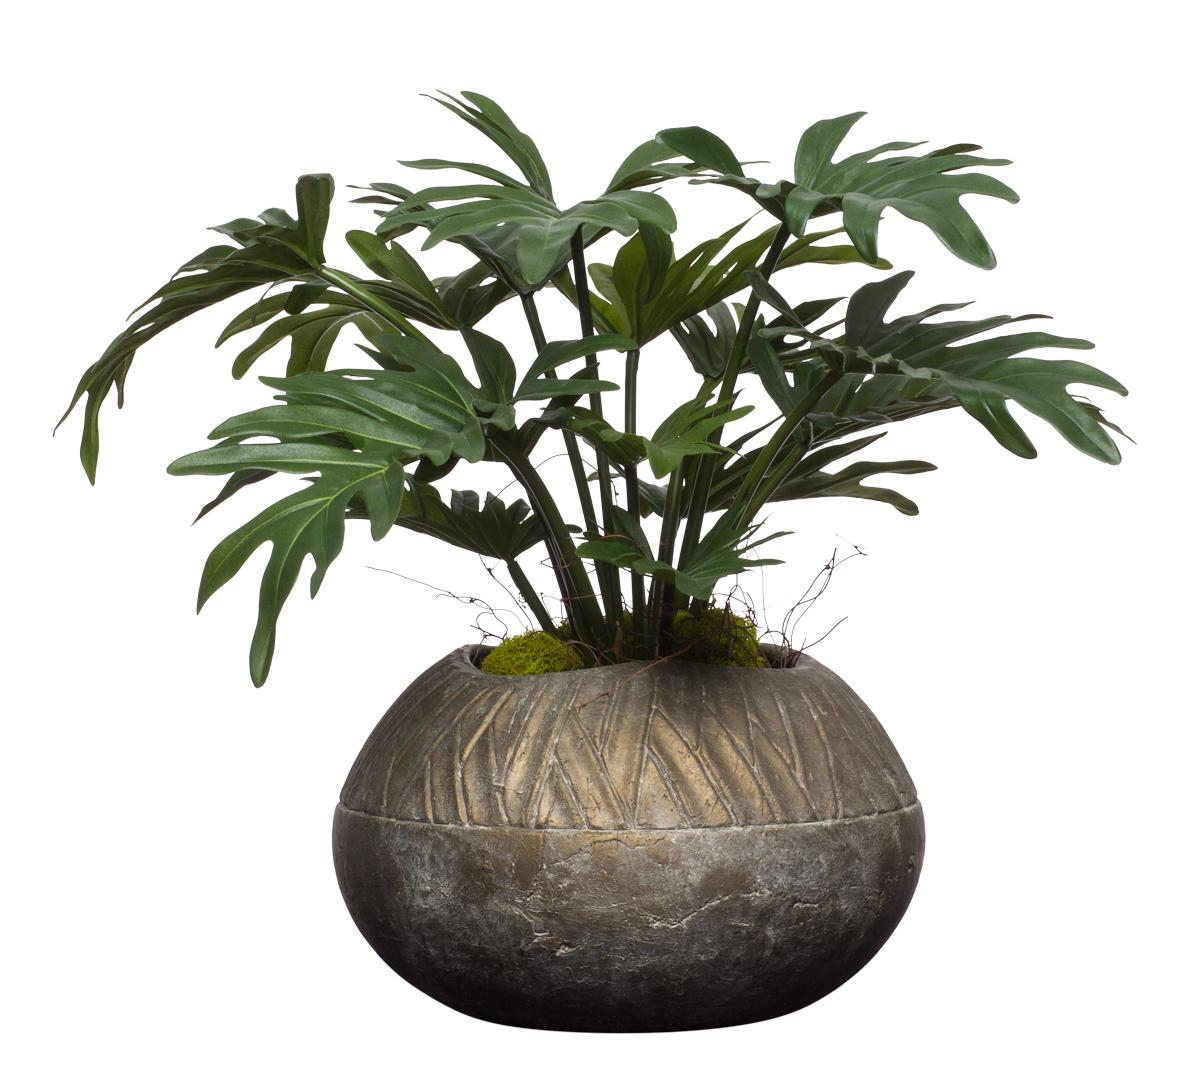 Selloum in Turban Pot